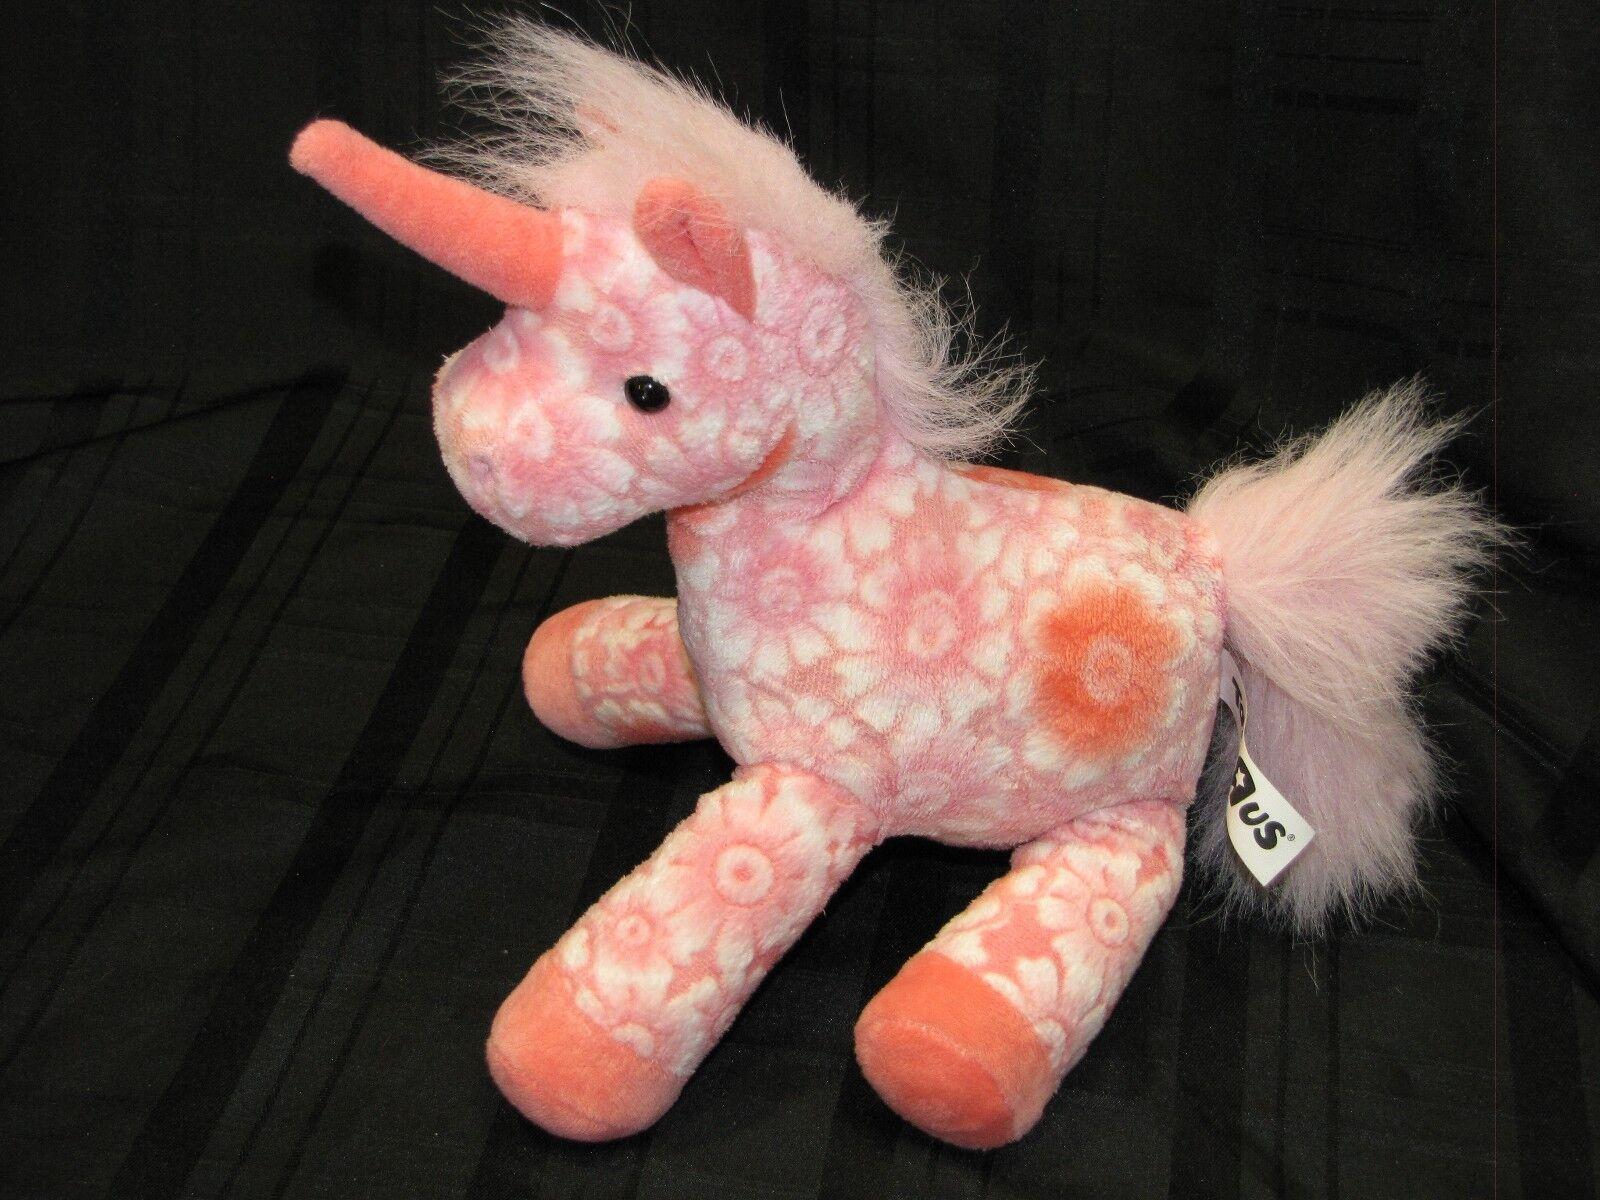 Toys R Us Unicorn Pink Flower Floral Embossed 2012 Plush Stuffed Animal Toy 11